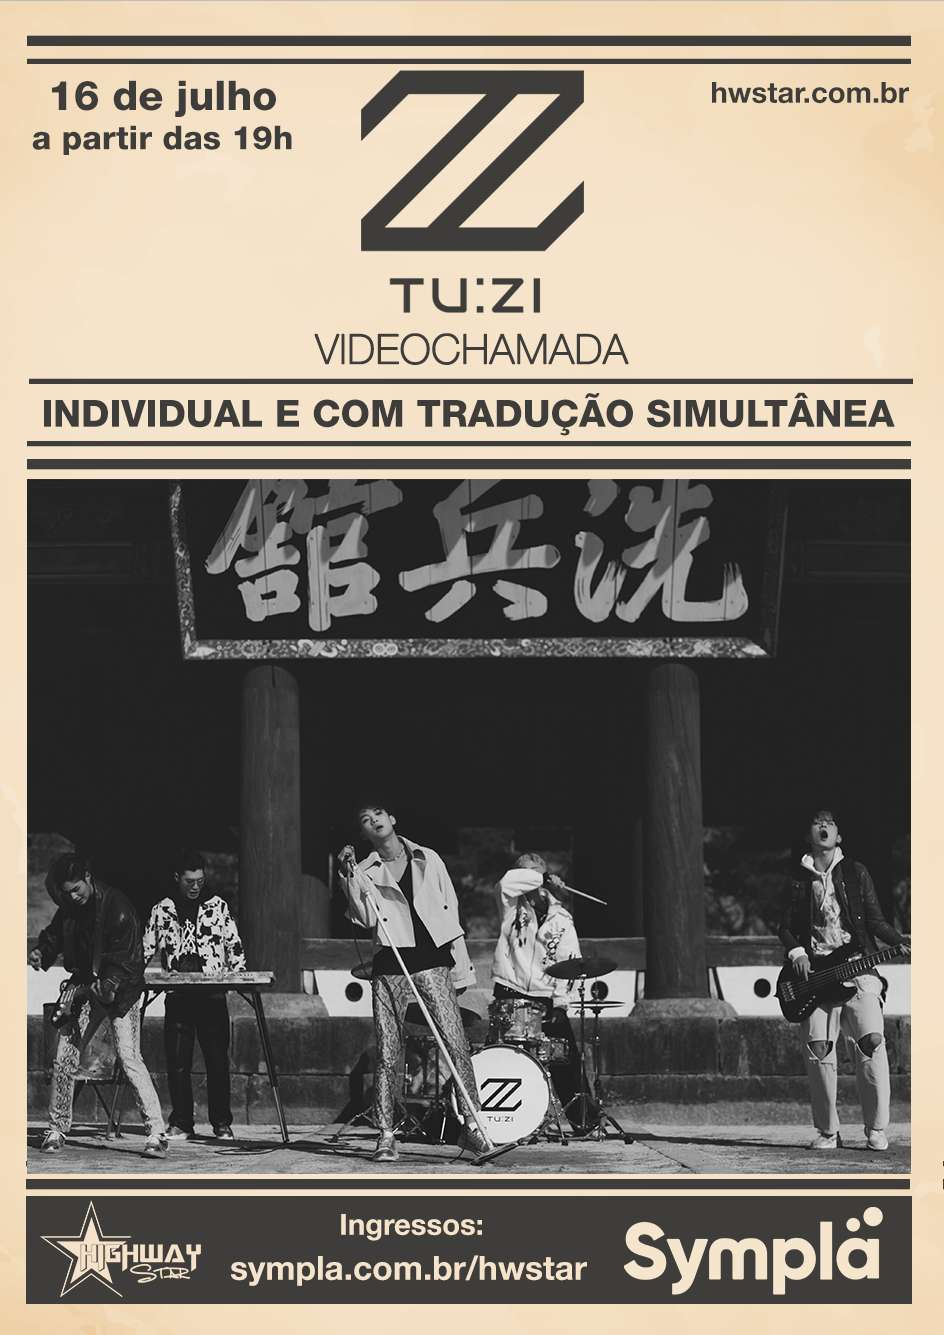 Banda 2Z Encontrará Fãs Brasileiros Através Do Highway Meet